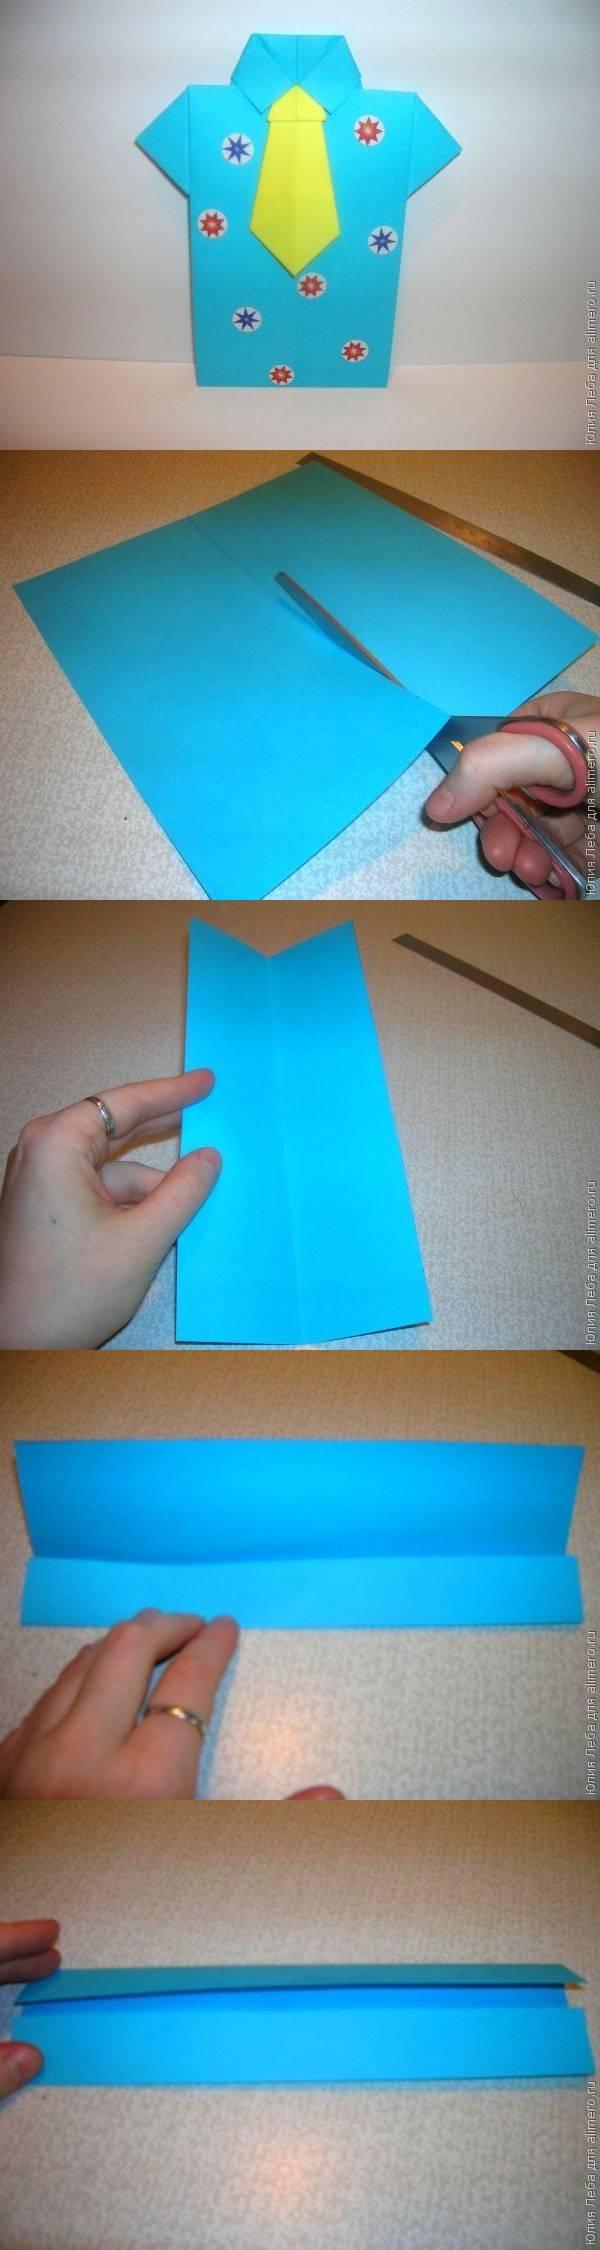 "Мастер-класс: открытка на 23 февраля ""Рубашка с галстуком"""